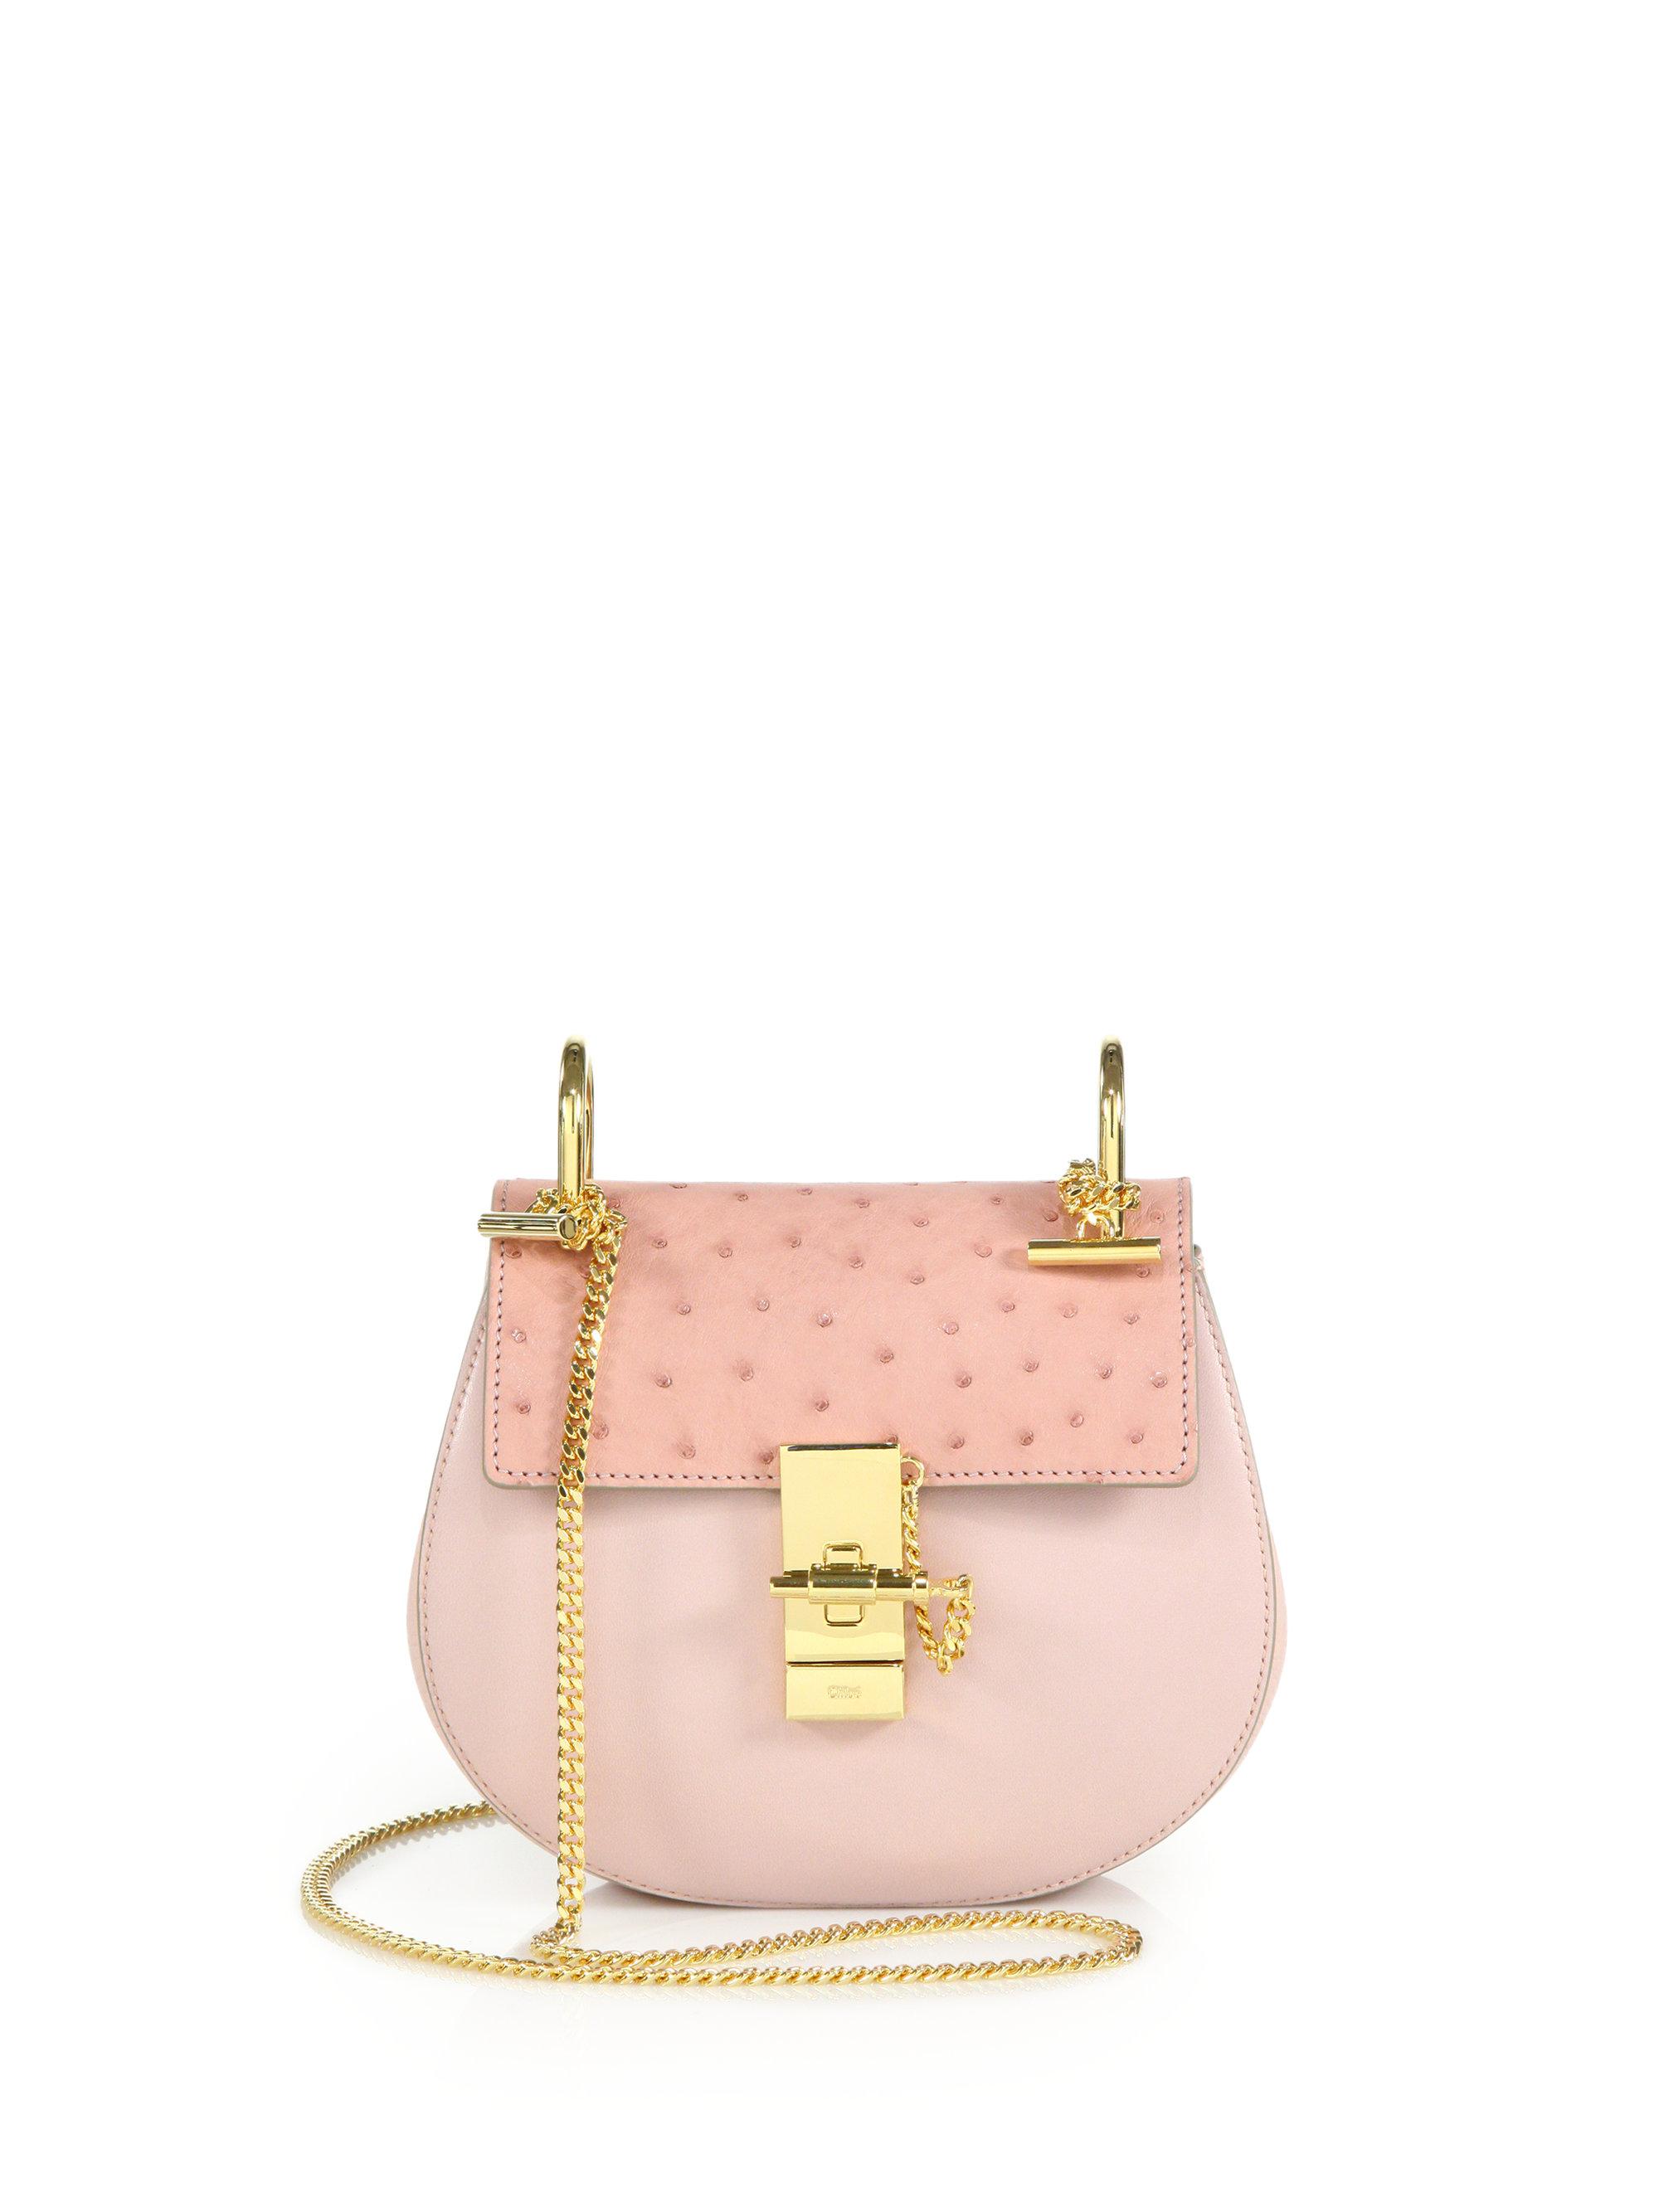 handbags chloe - Chlo�� Drew Mini Leather Cross-Body Bag in Pink (marshmallow)   Lyst